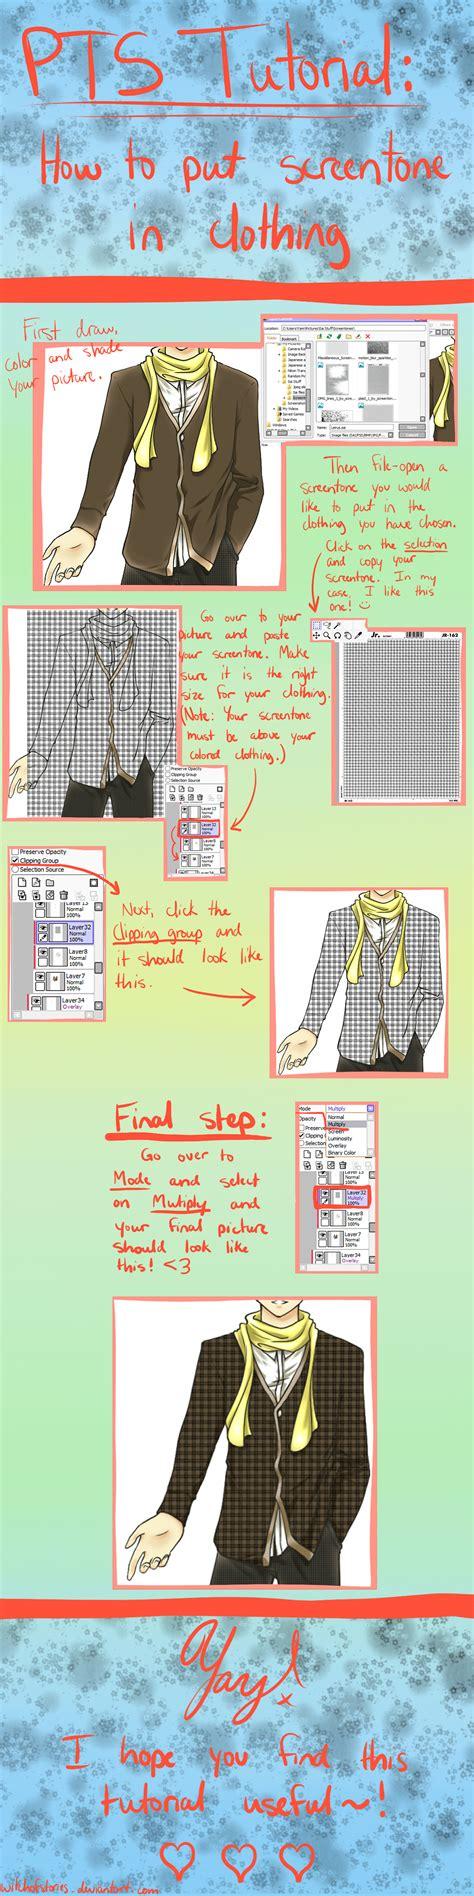 paint tool sai screentone paint tool sai tutorial screentones in clothing by